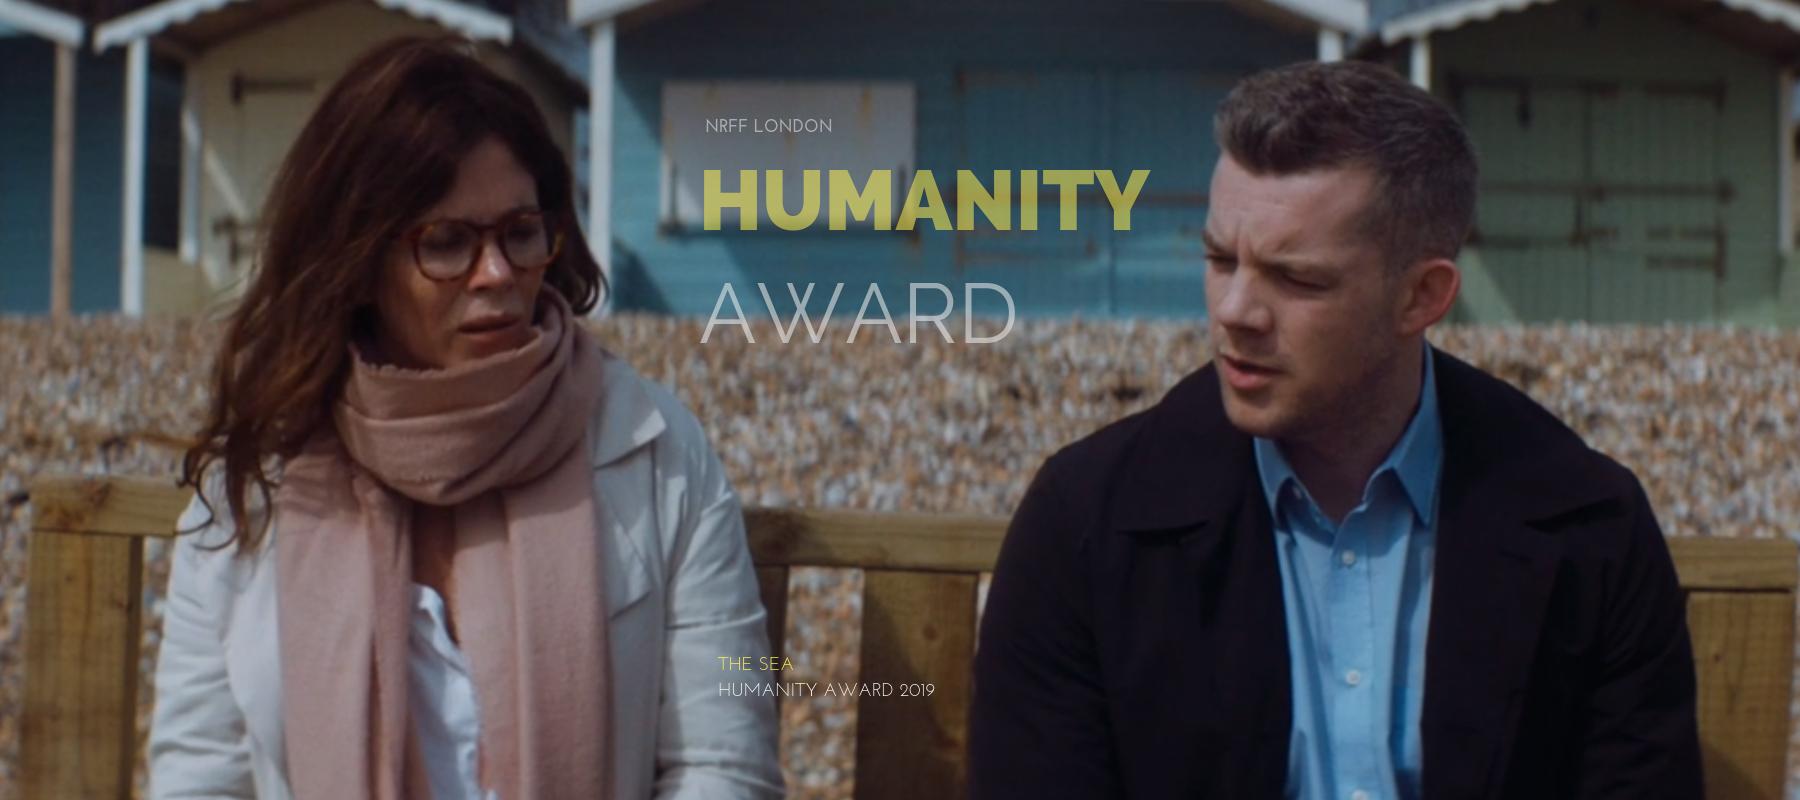 <a href='https://newrenaissancefilmfest.com/humanity-award'></a>